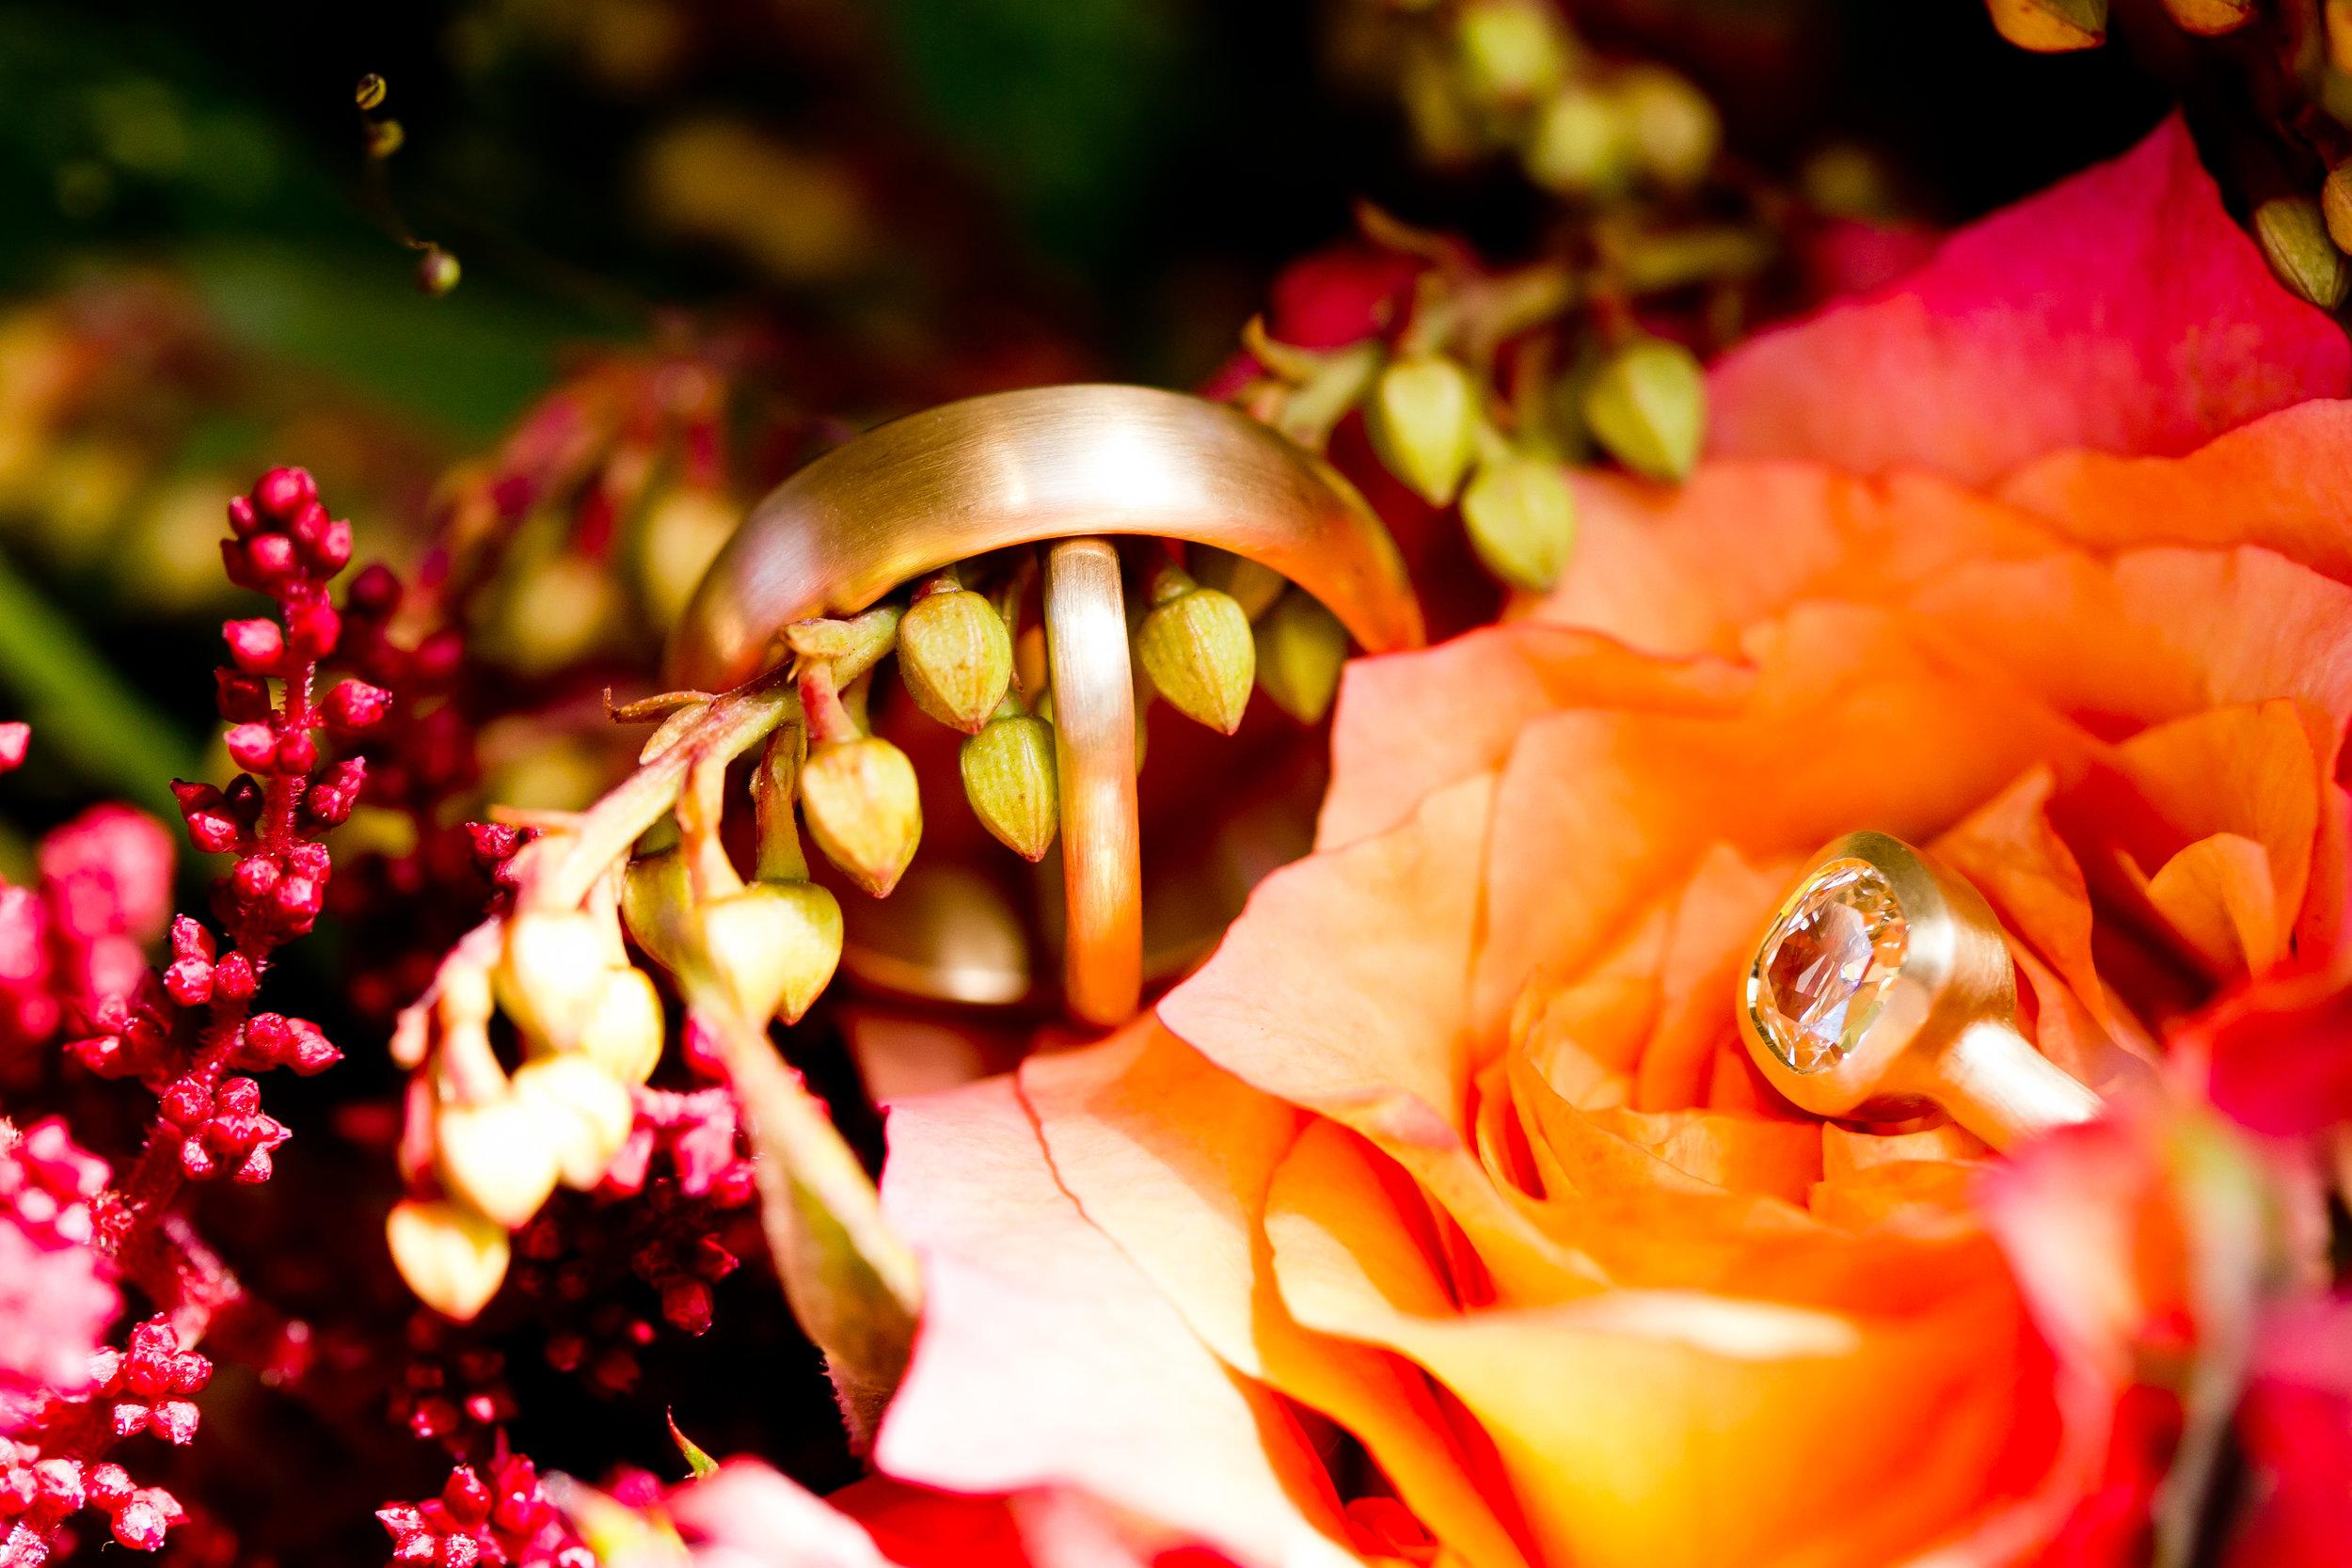 Custom 18k Gold Wedding Bands by Monica Marcella